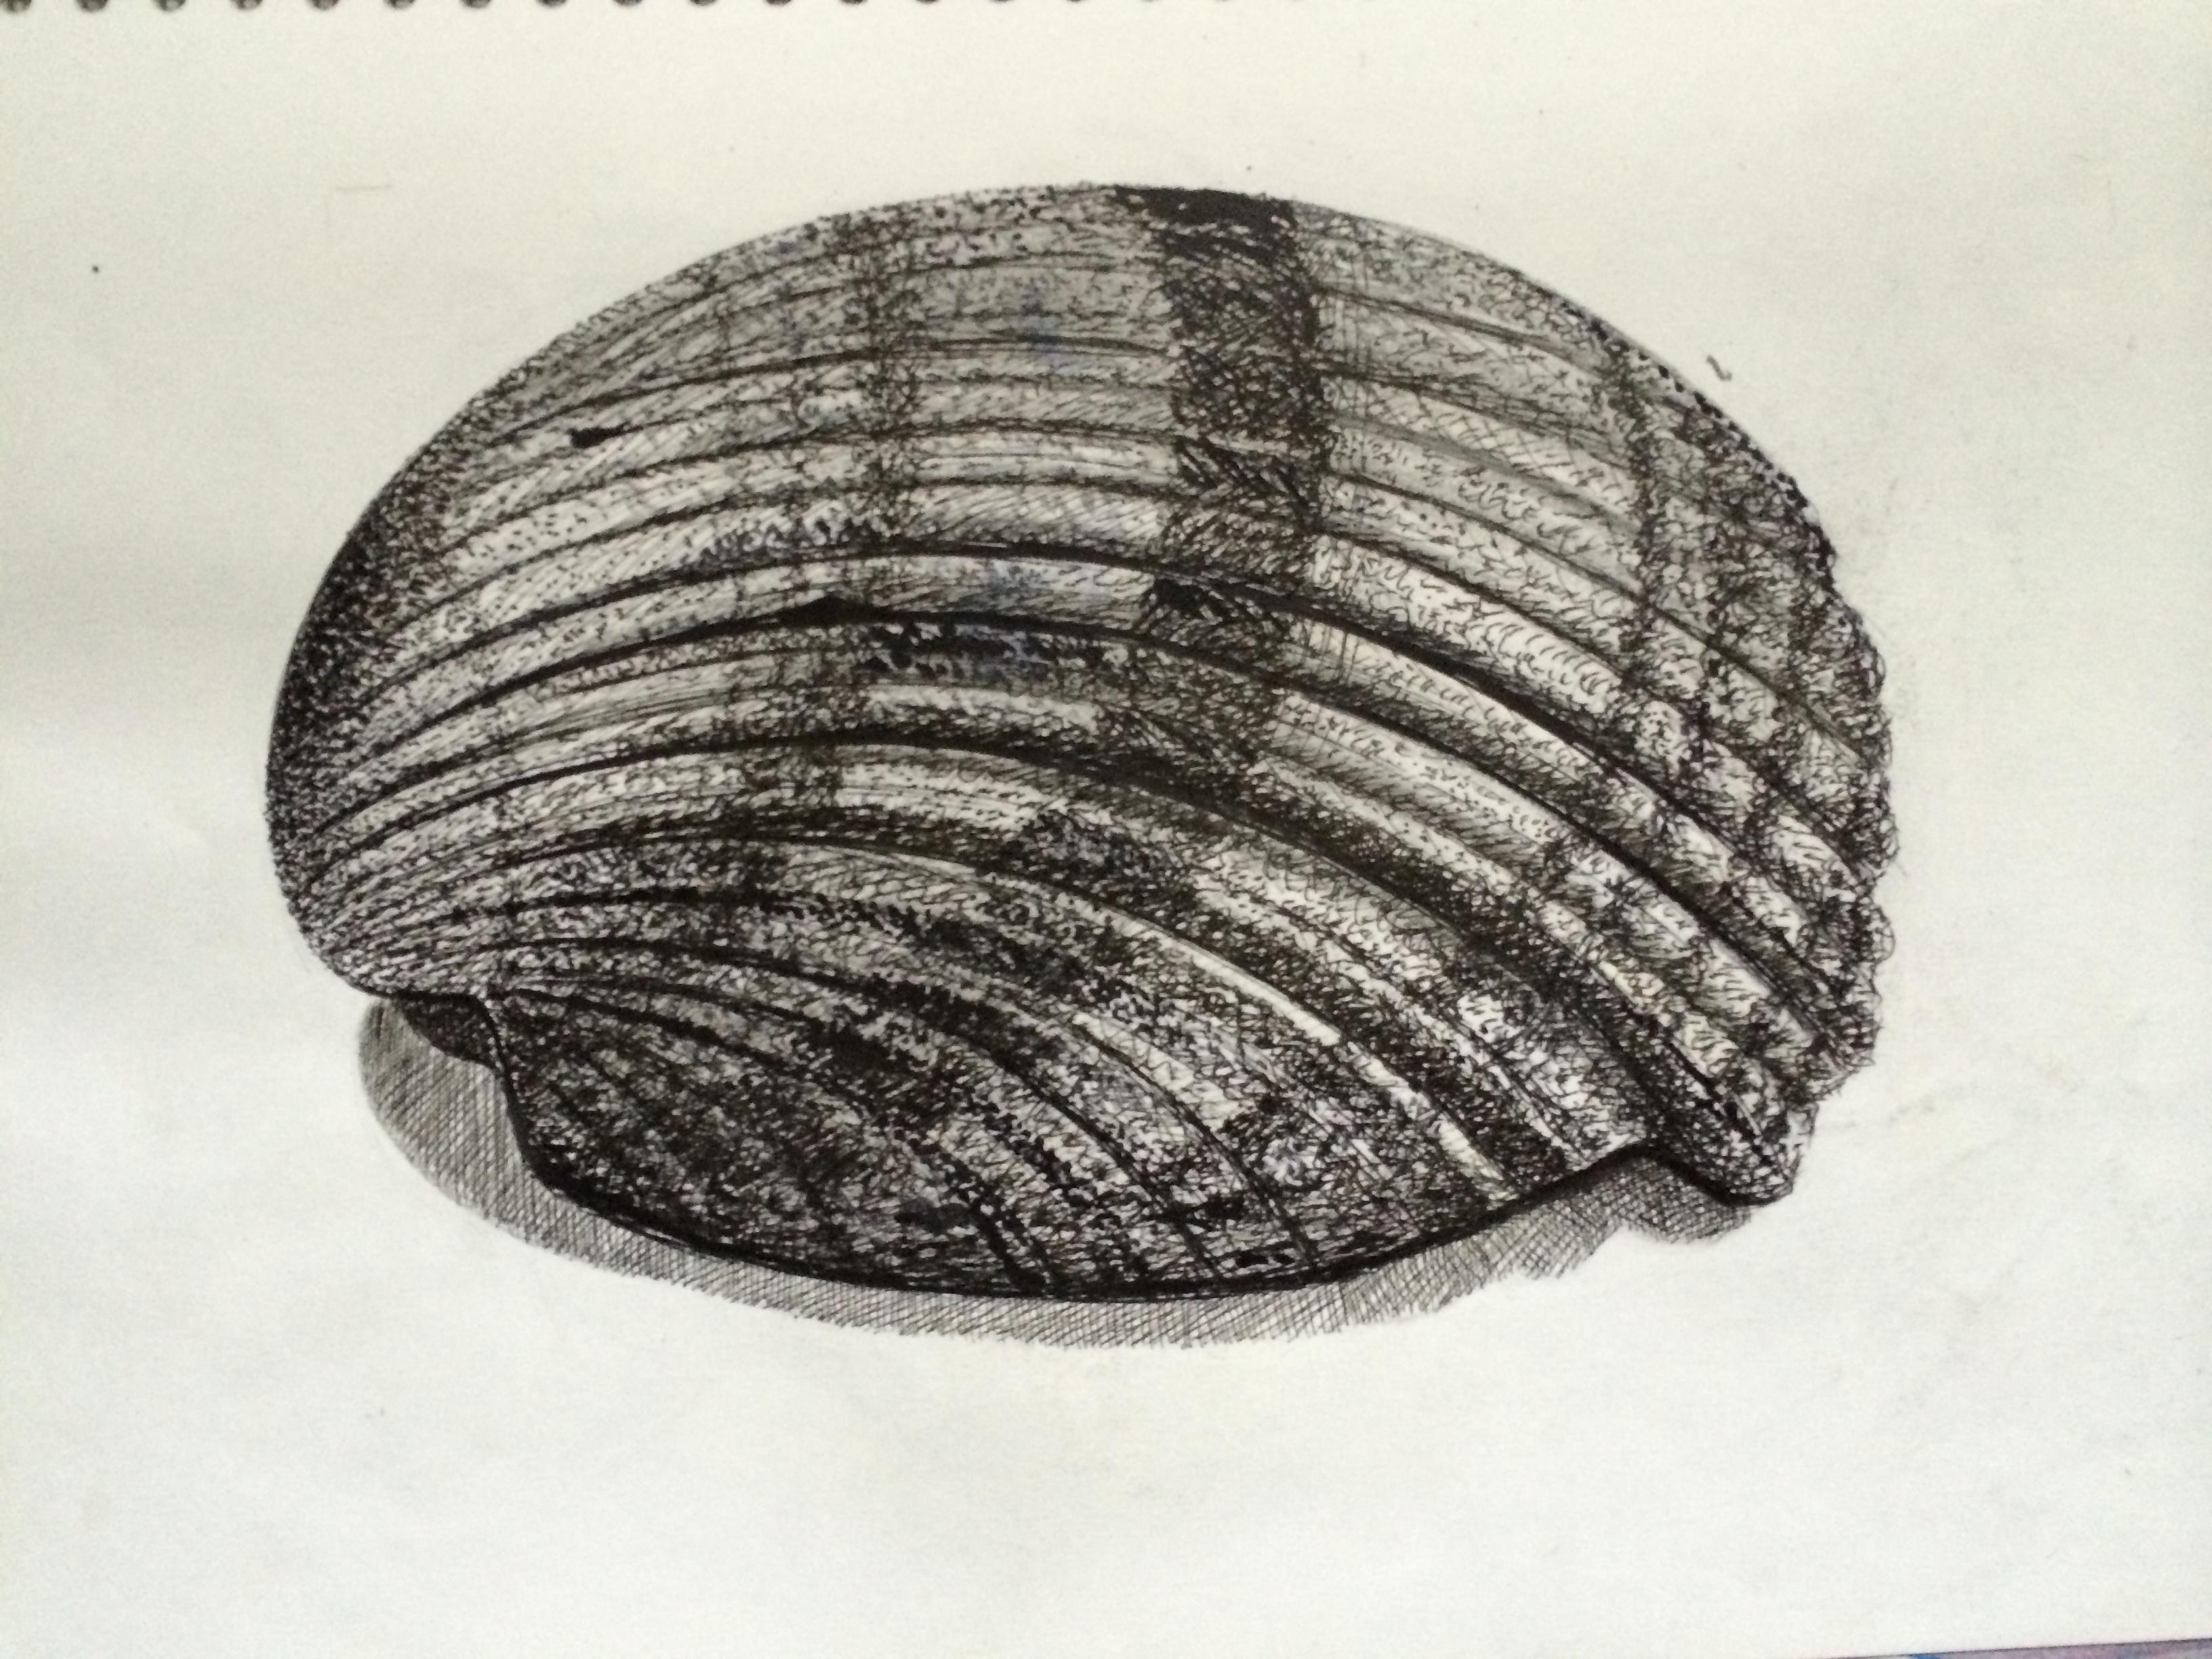 Drawn pen shell Dots and September 2014 black